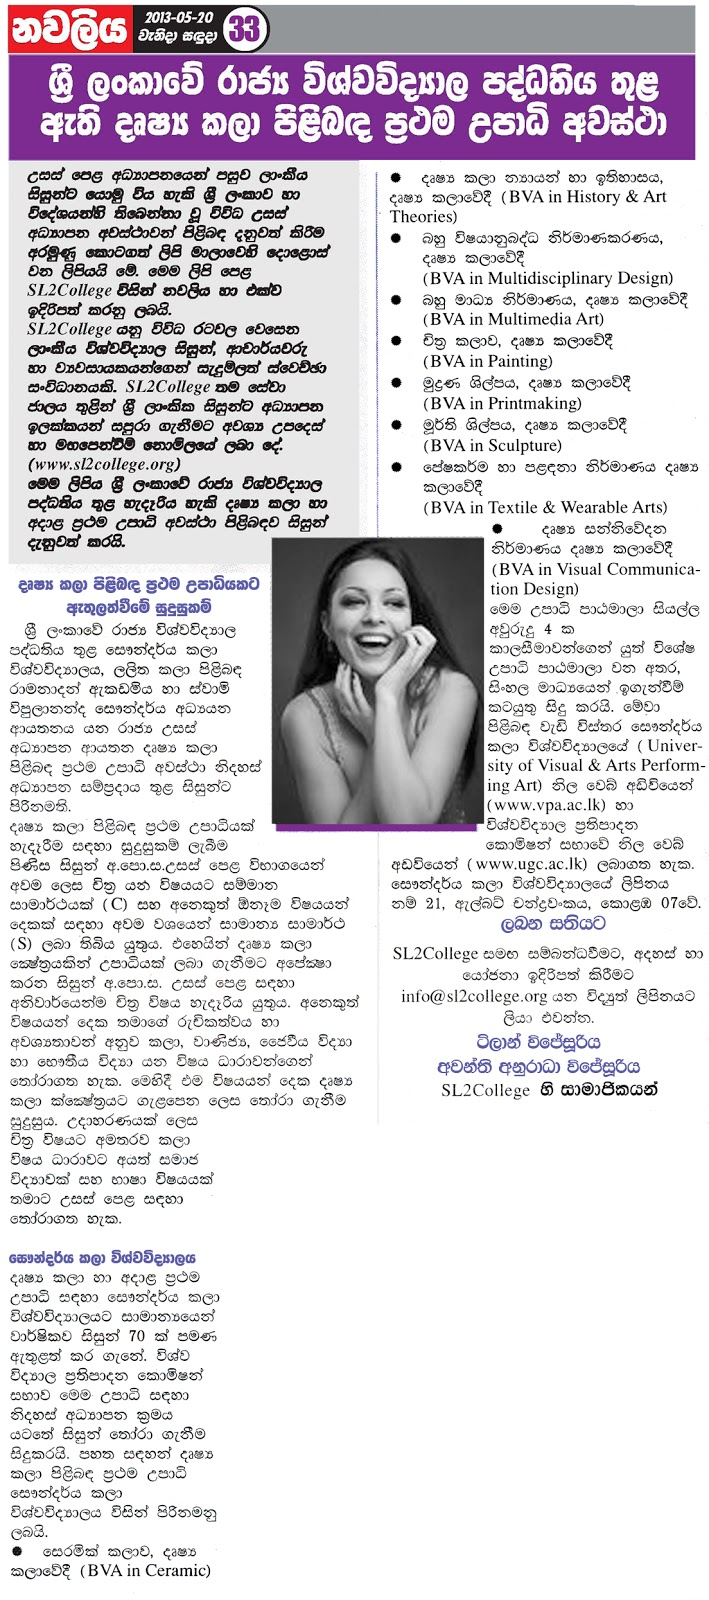 Paparasinewslanka Paper Article Nawaliya Samanali Html